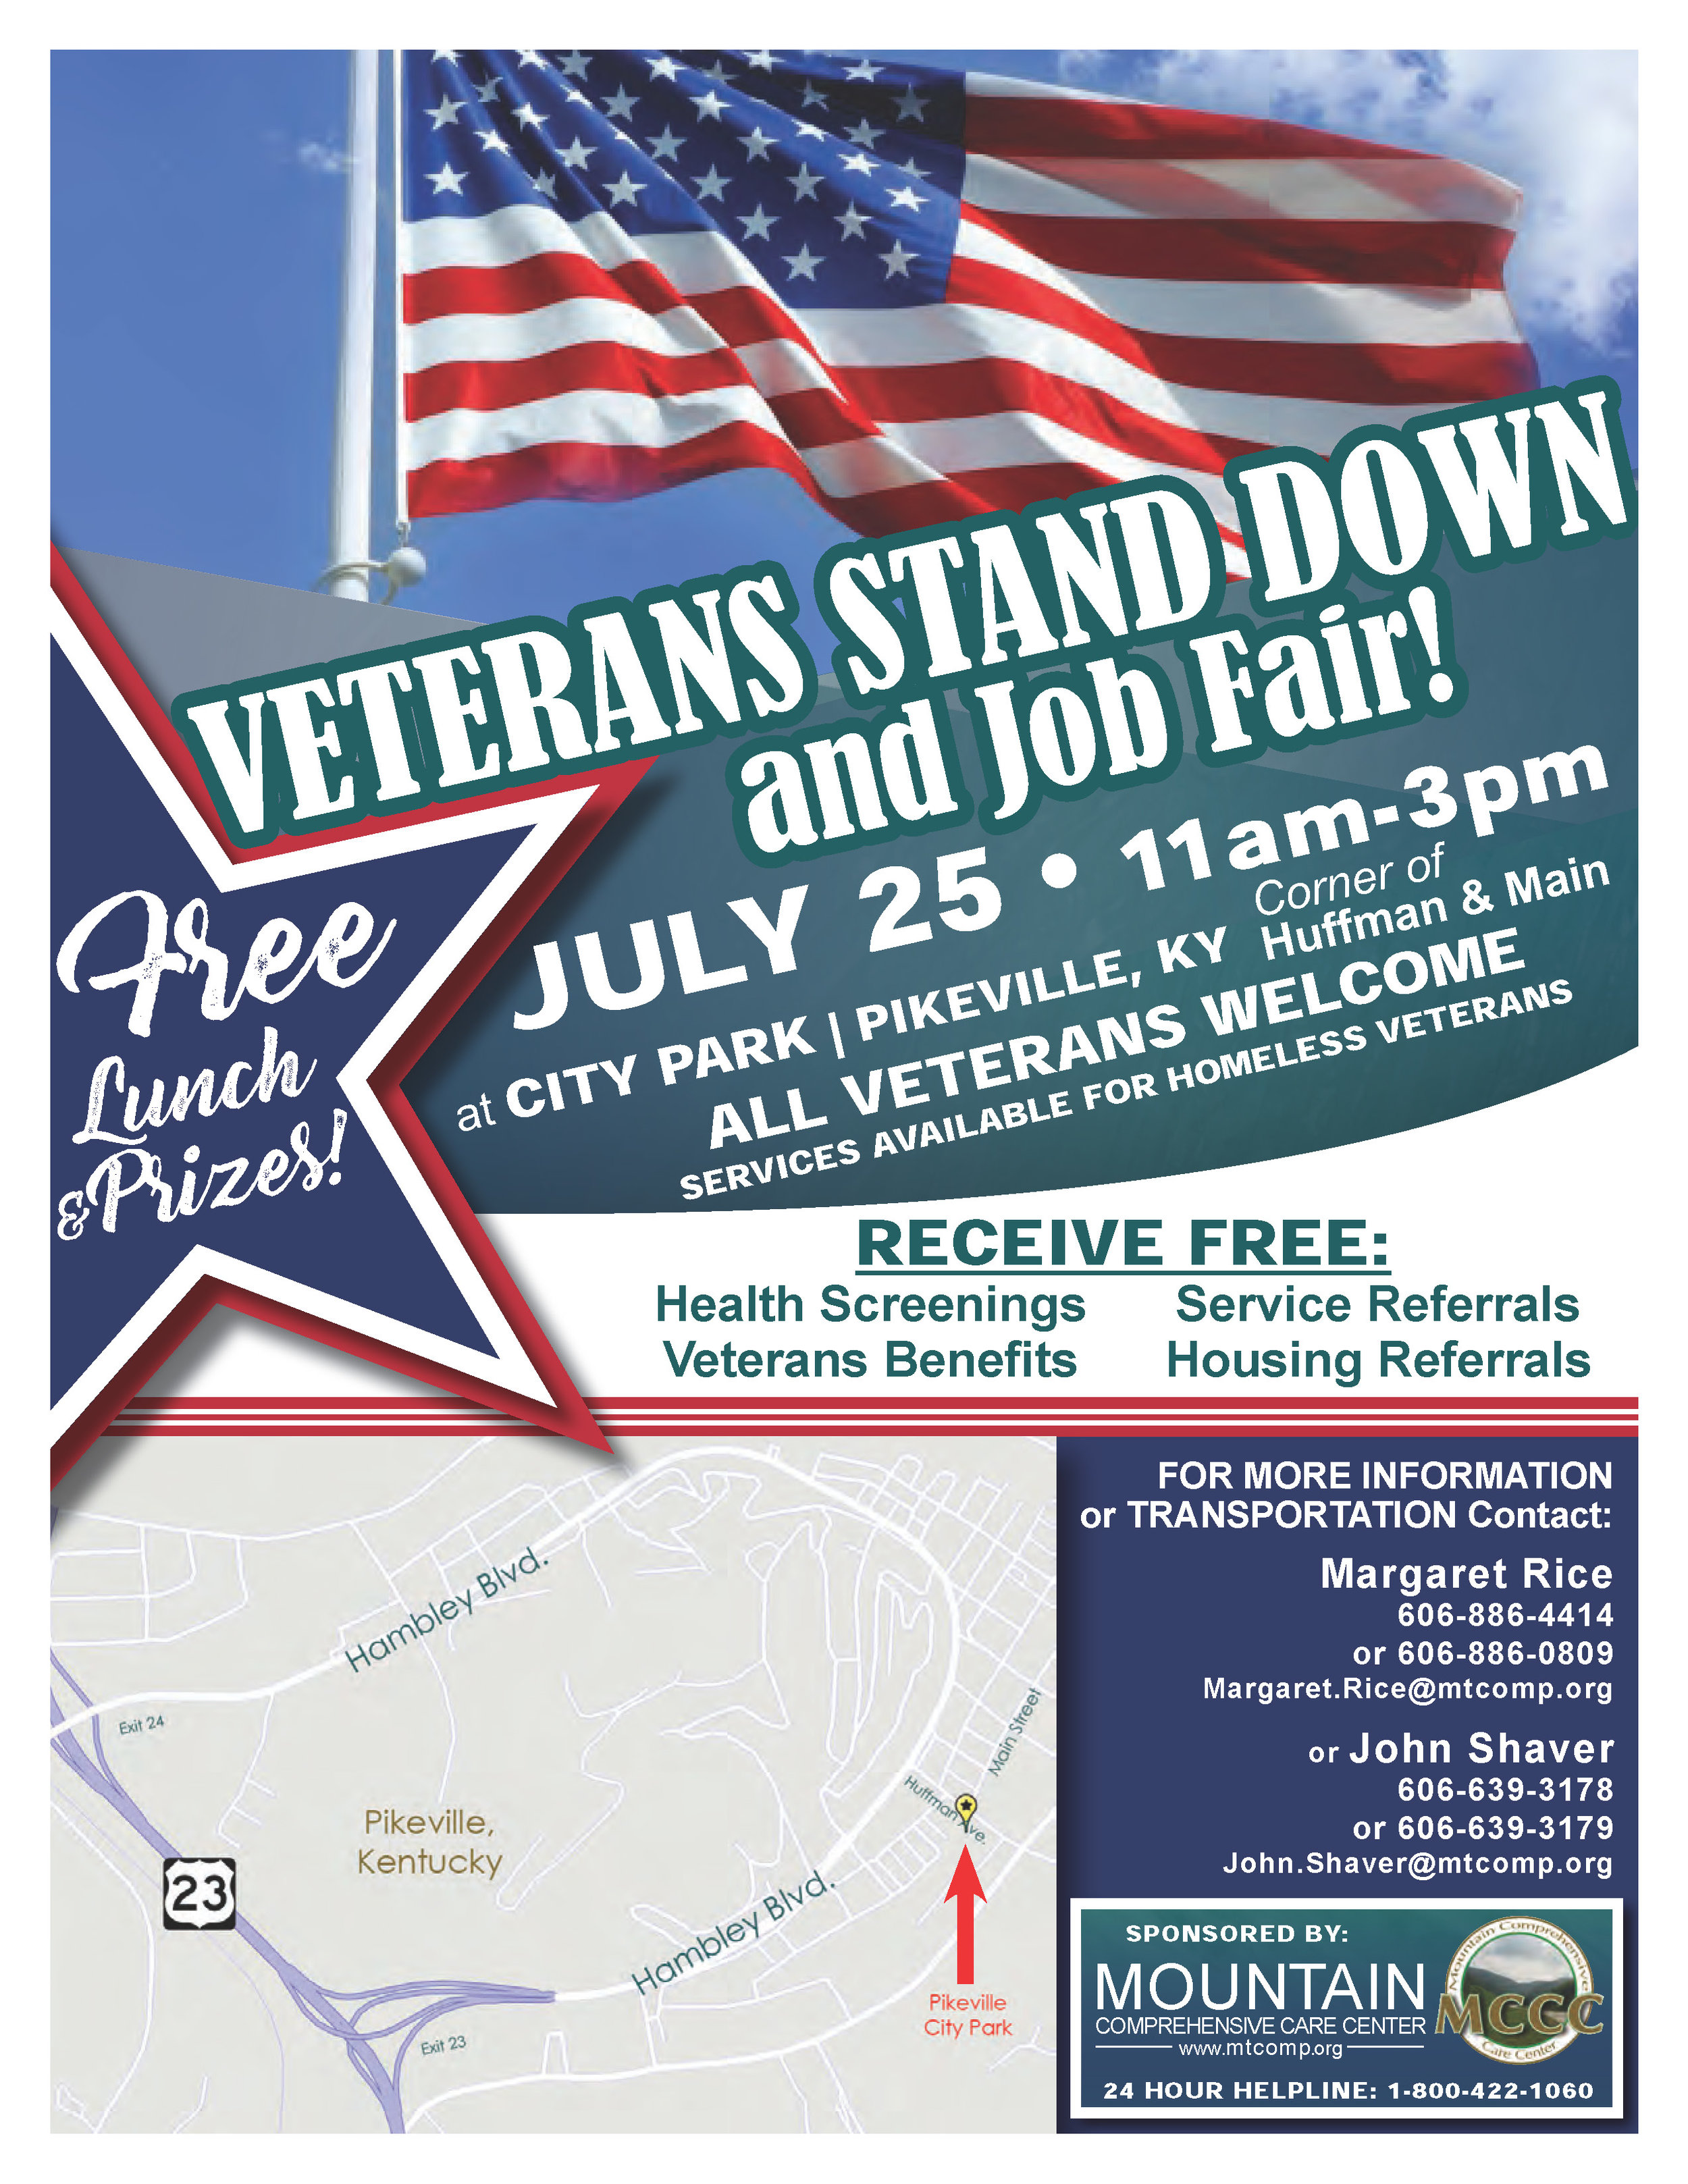 veterans_stand_down_job_fair20192.jpg